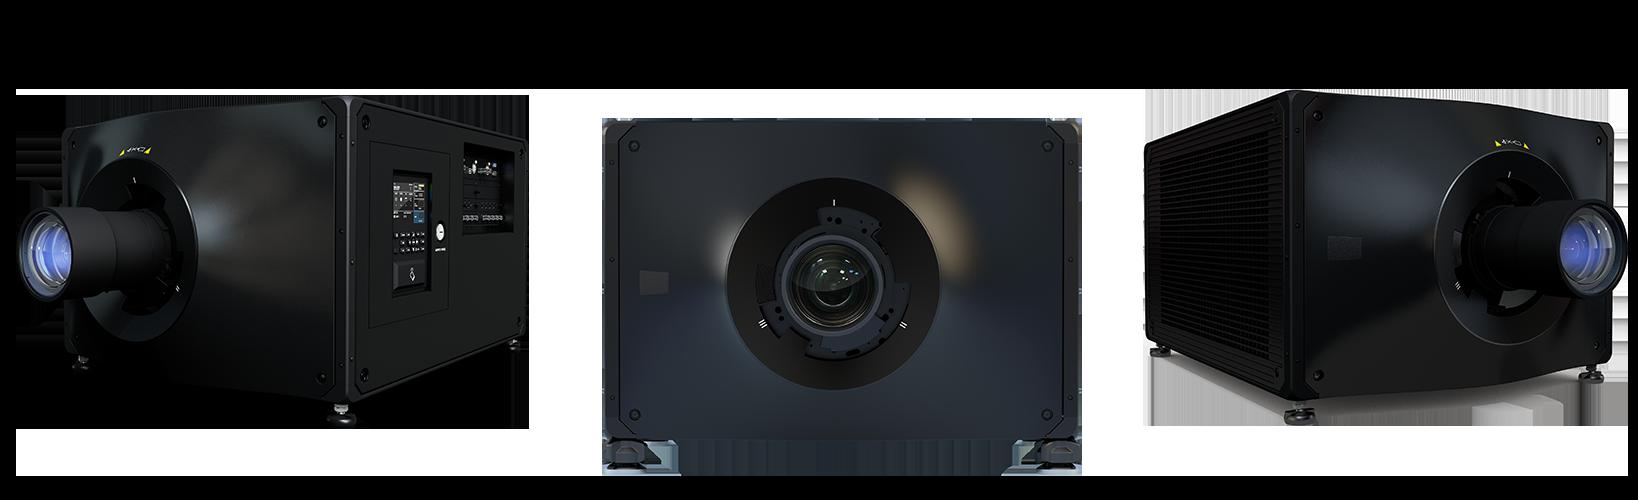 Christie D4K40RGB laserprojector